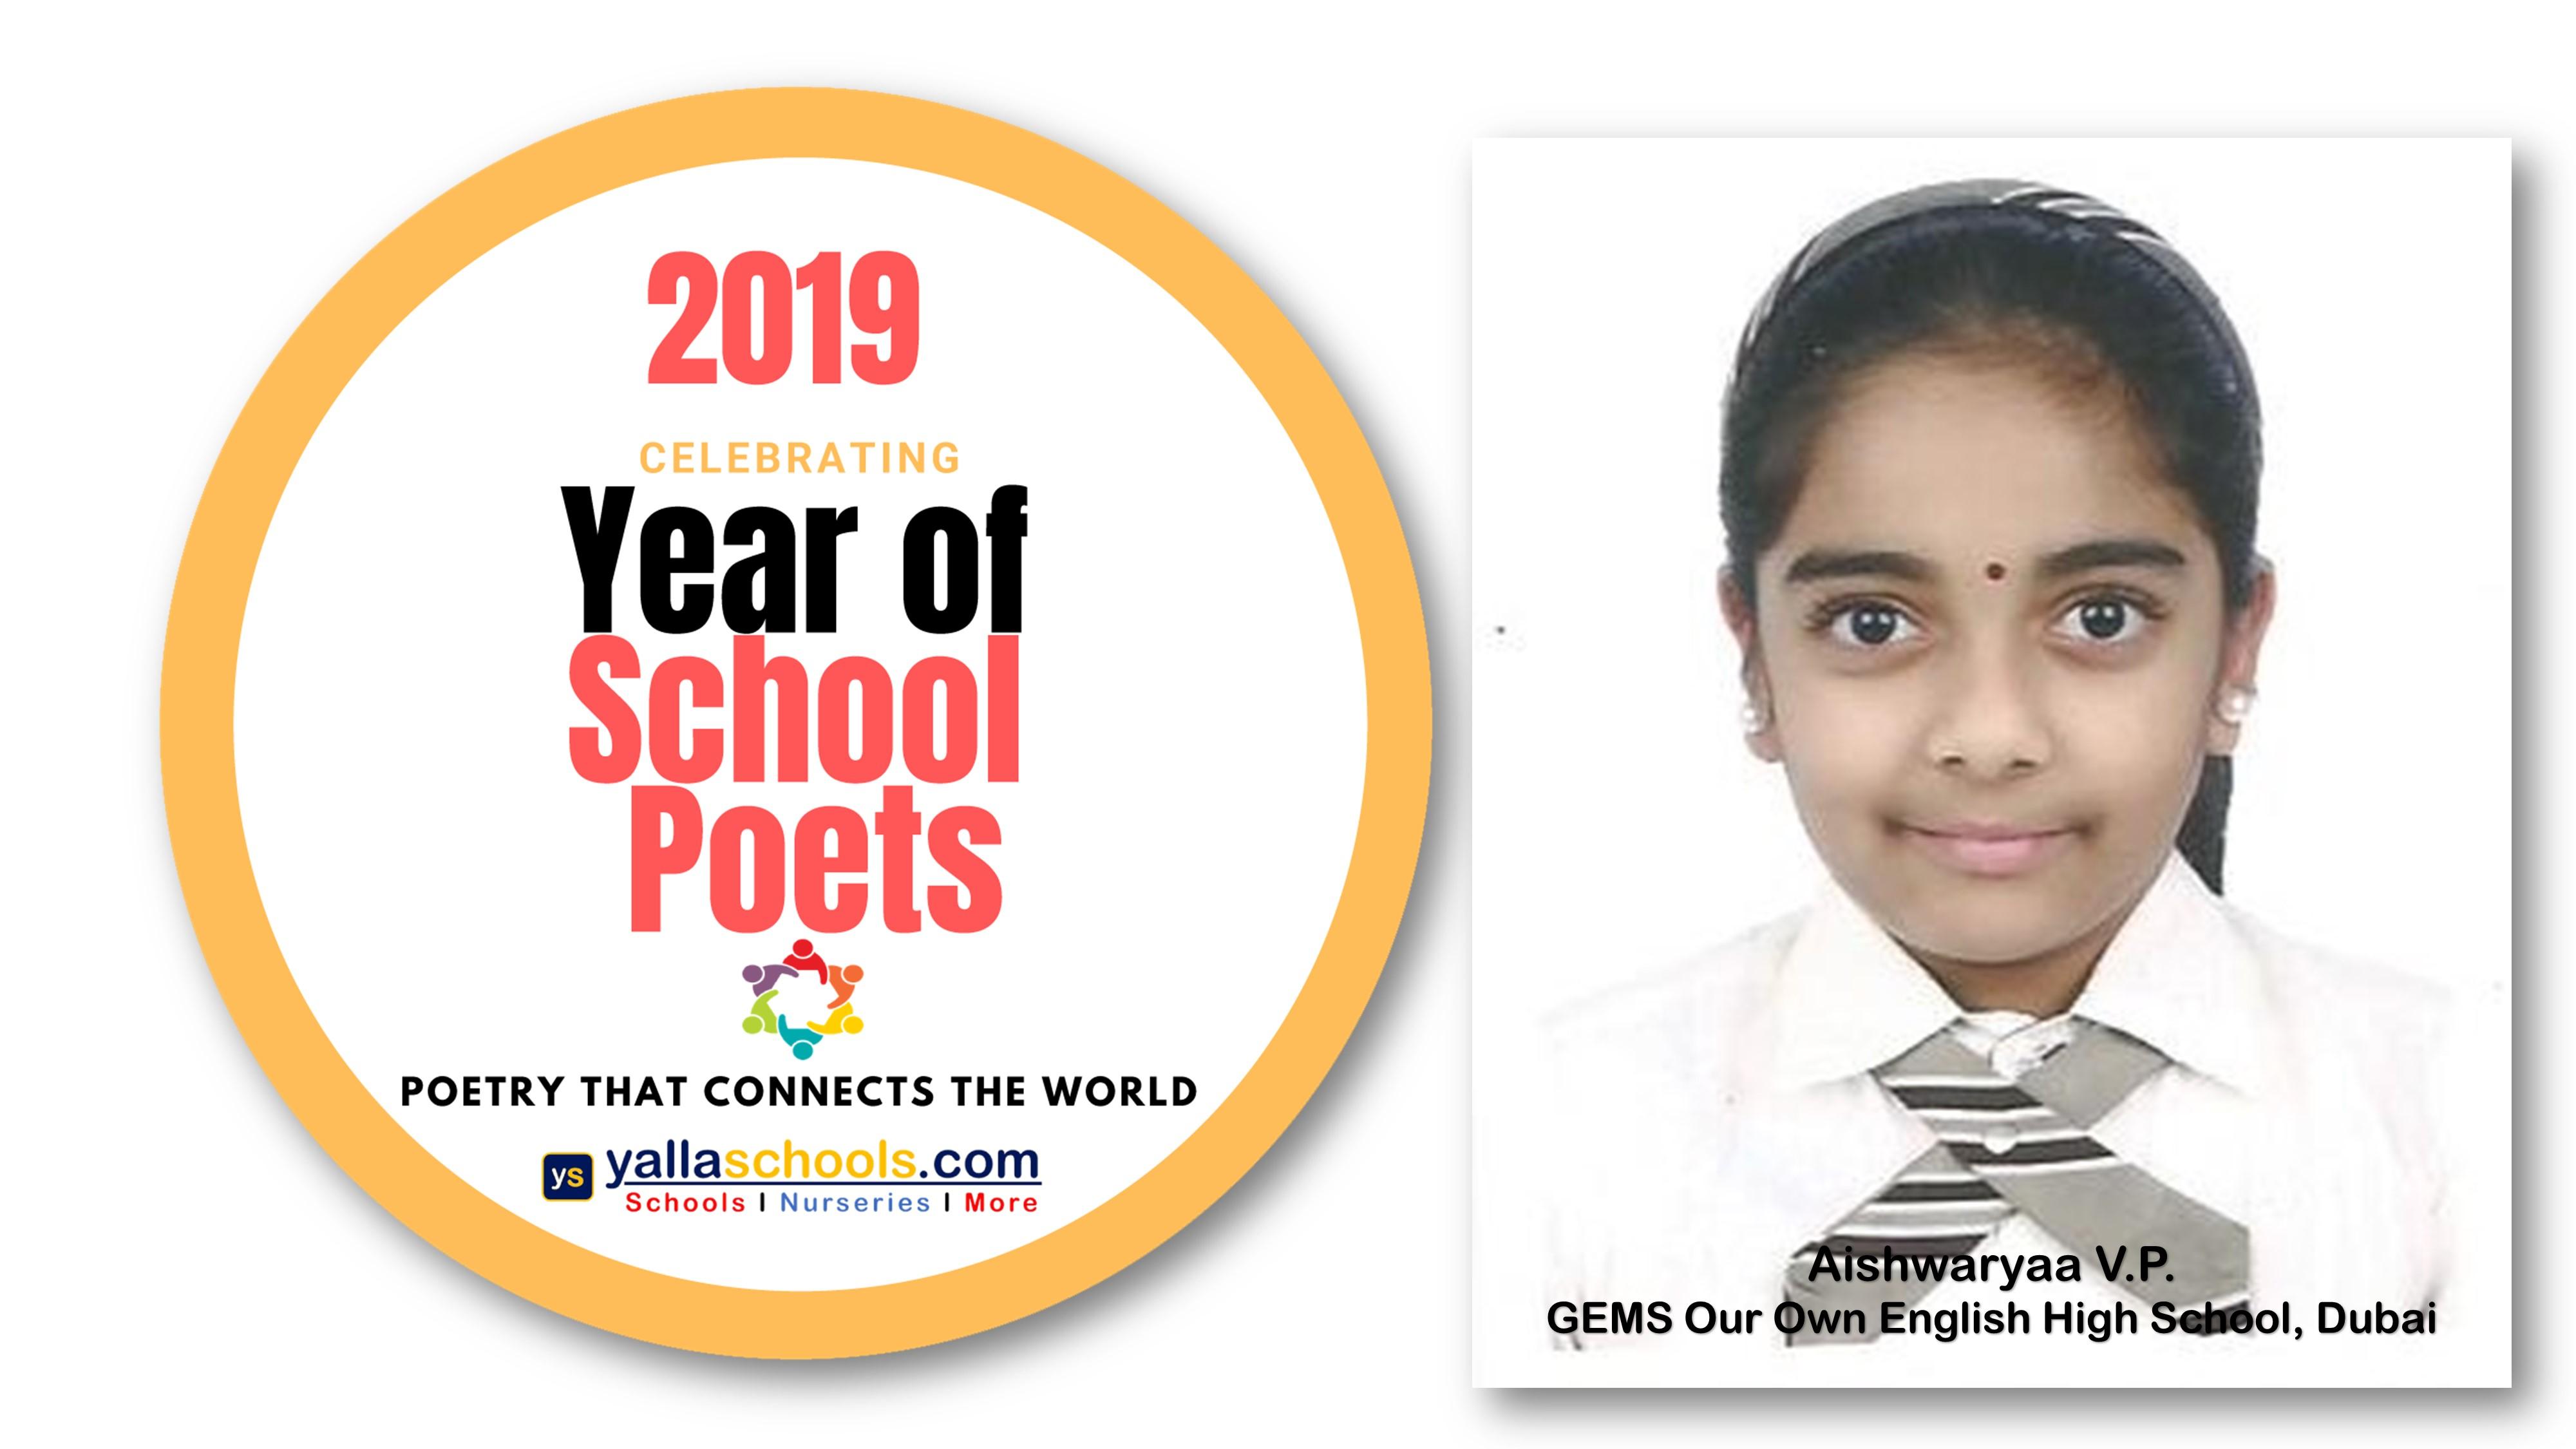 2019_Year_of_School_Poets,_Aishwaryaa_V_P,_GEMS_Our_Own_High_School,_Dubai